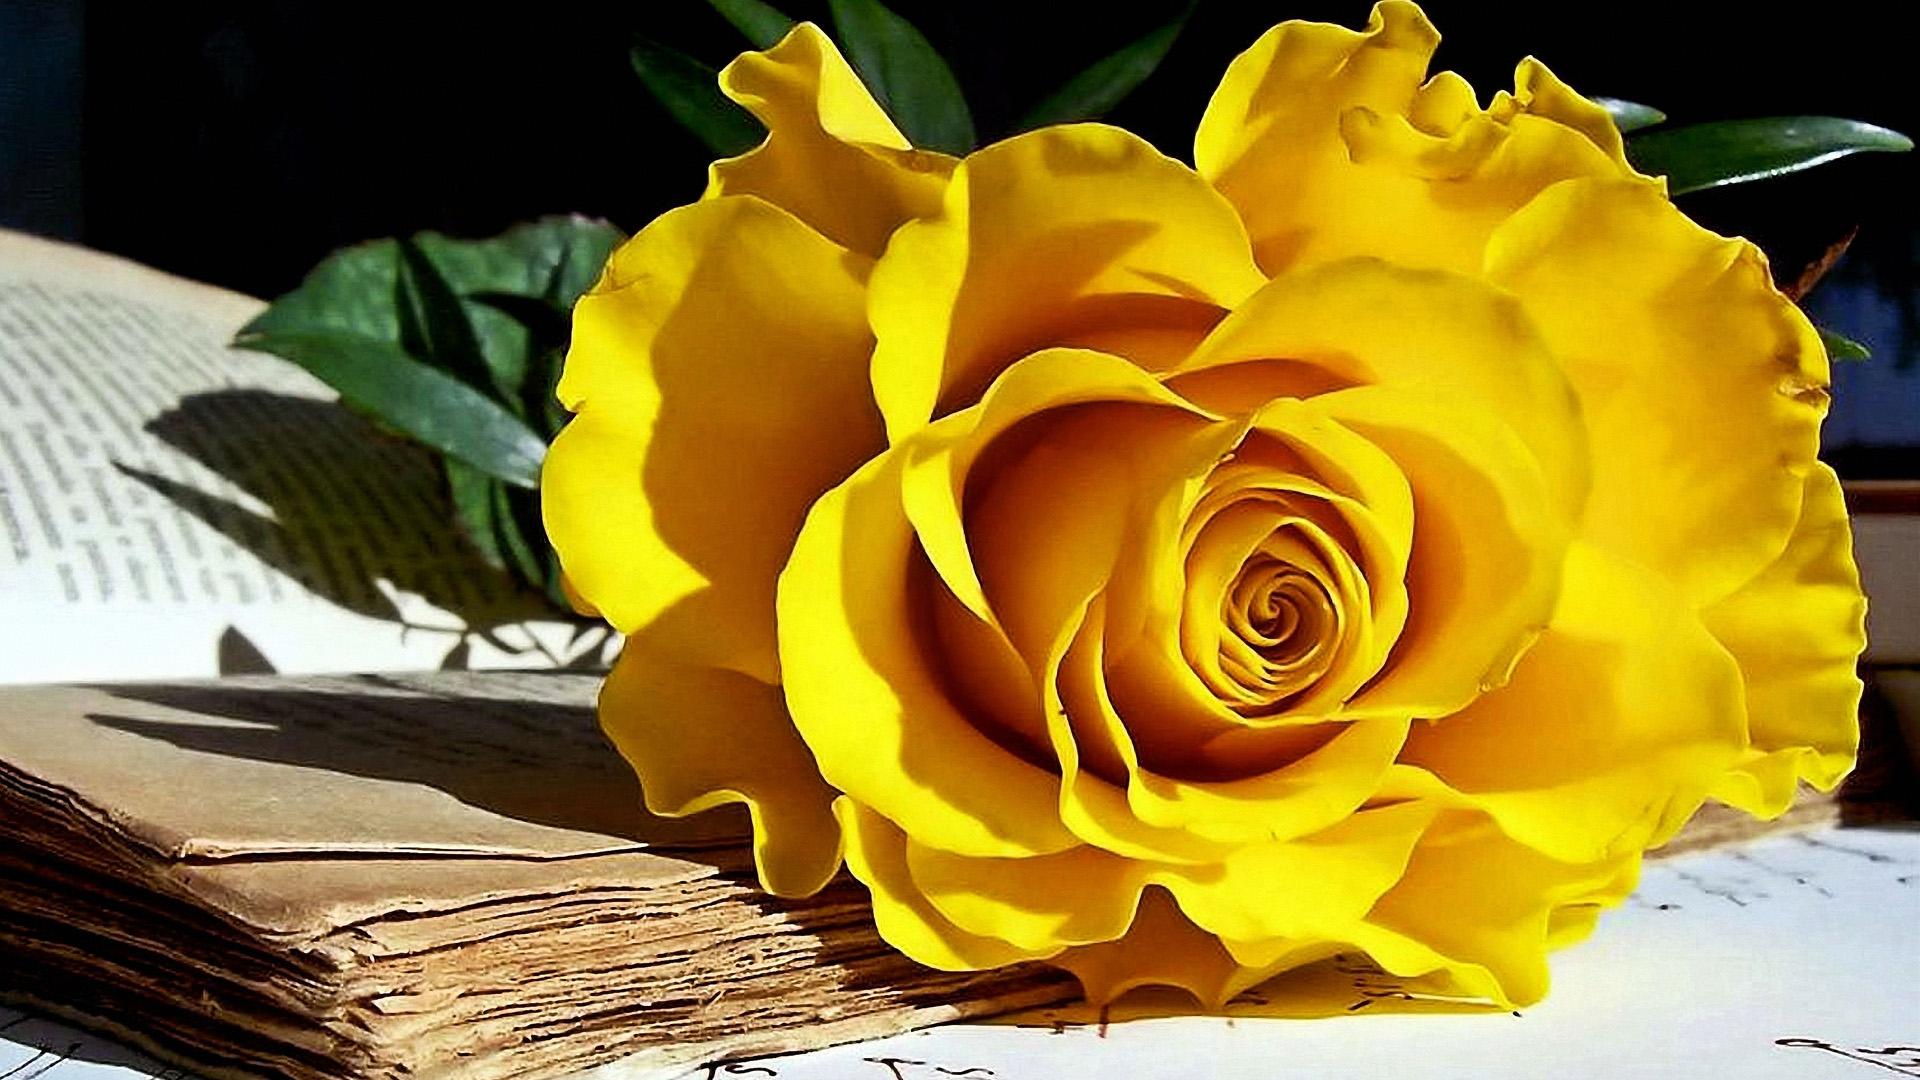 Yellow rose flower wallpapers wallpaper 1920x1080 mightylinksfo